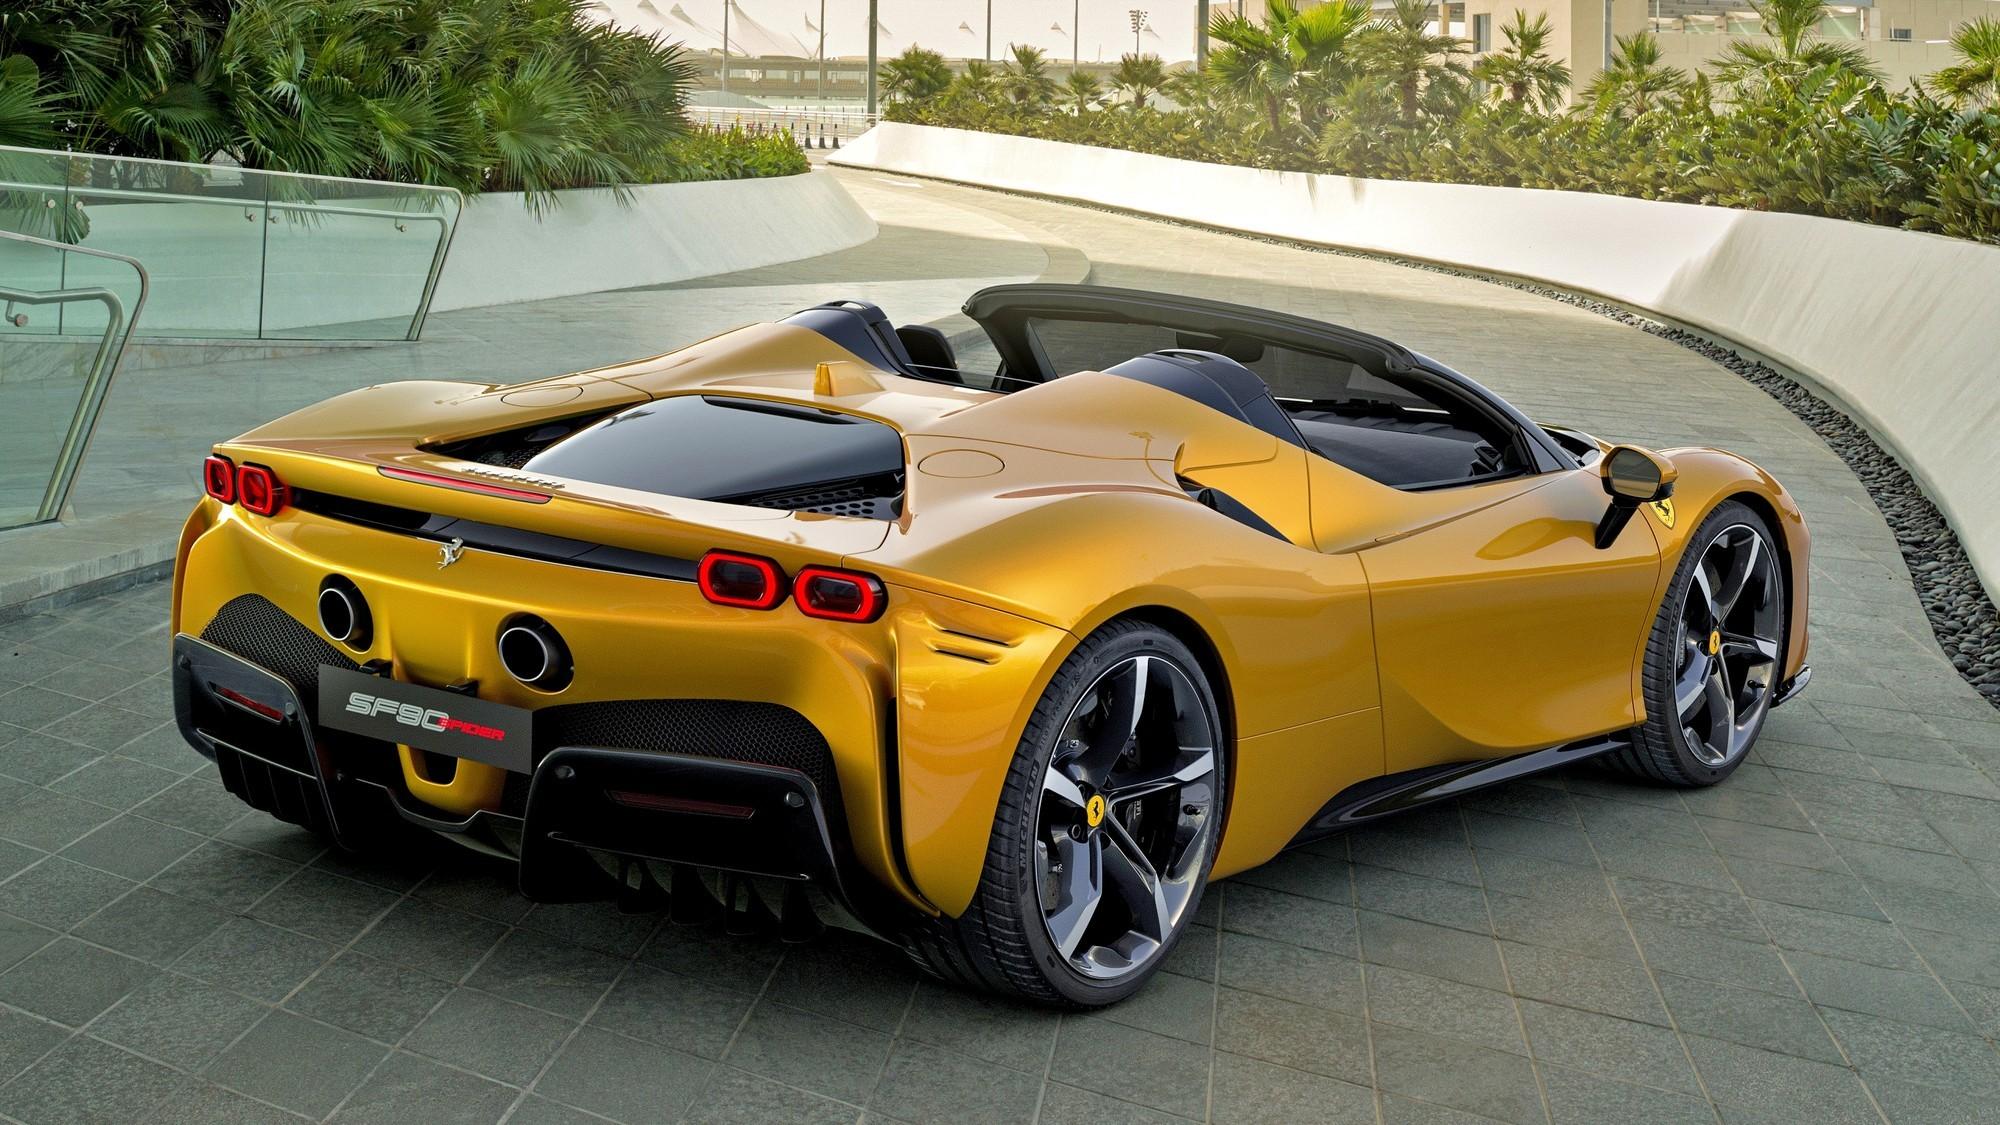 Ferrari SF90 Spider: на 100 кг тяжелее купе, зато с жёсткой складной крышей